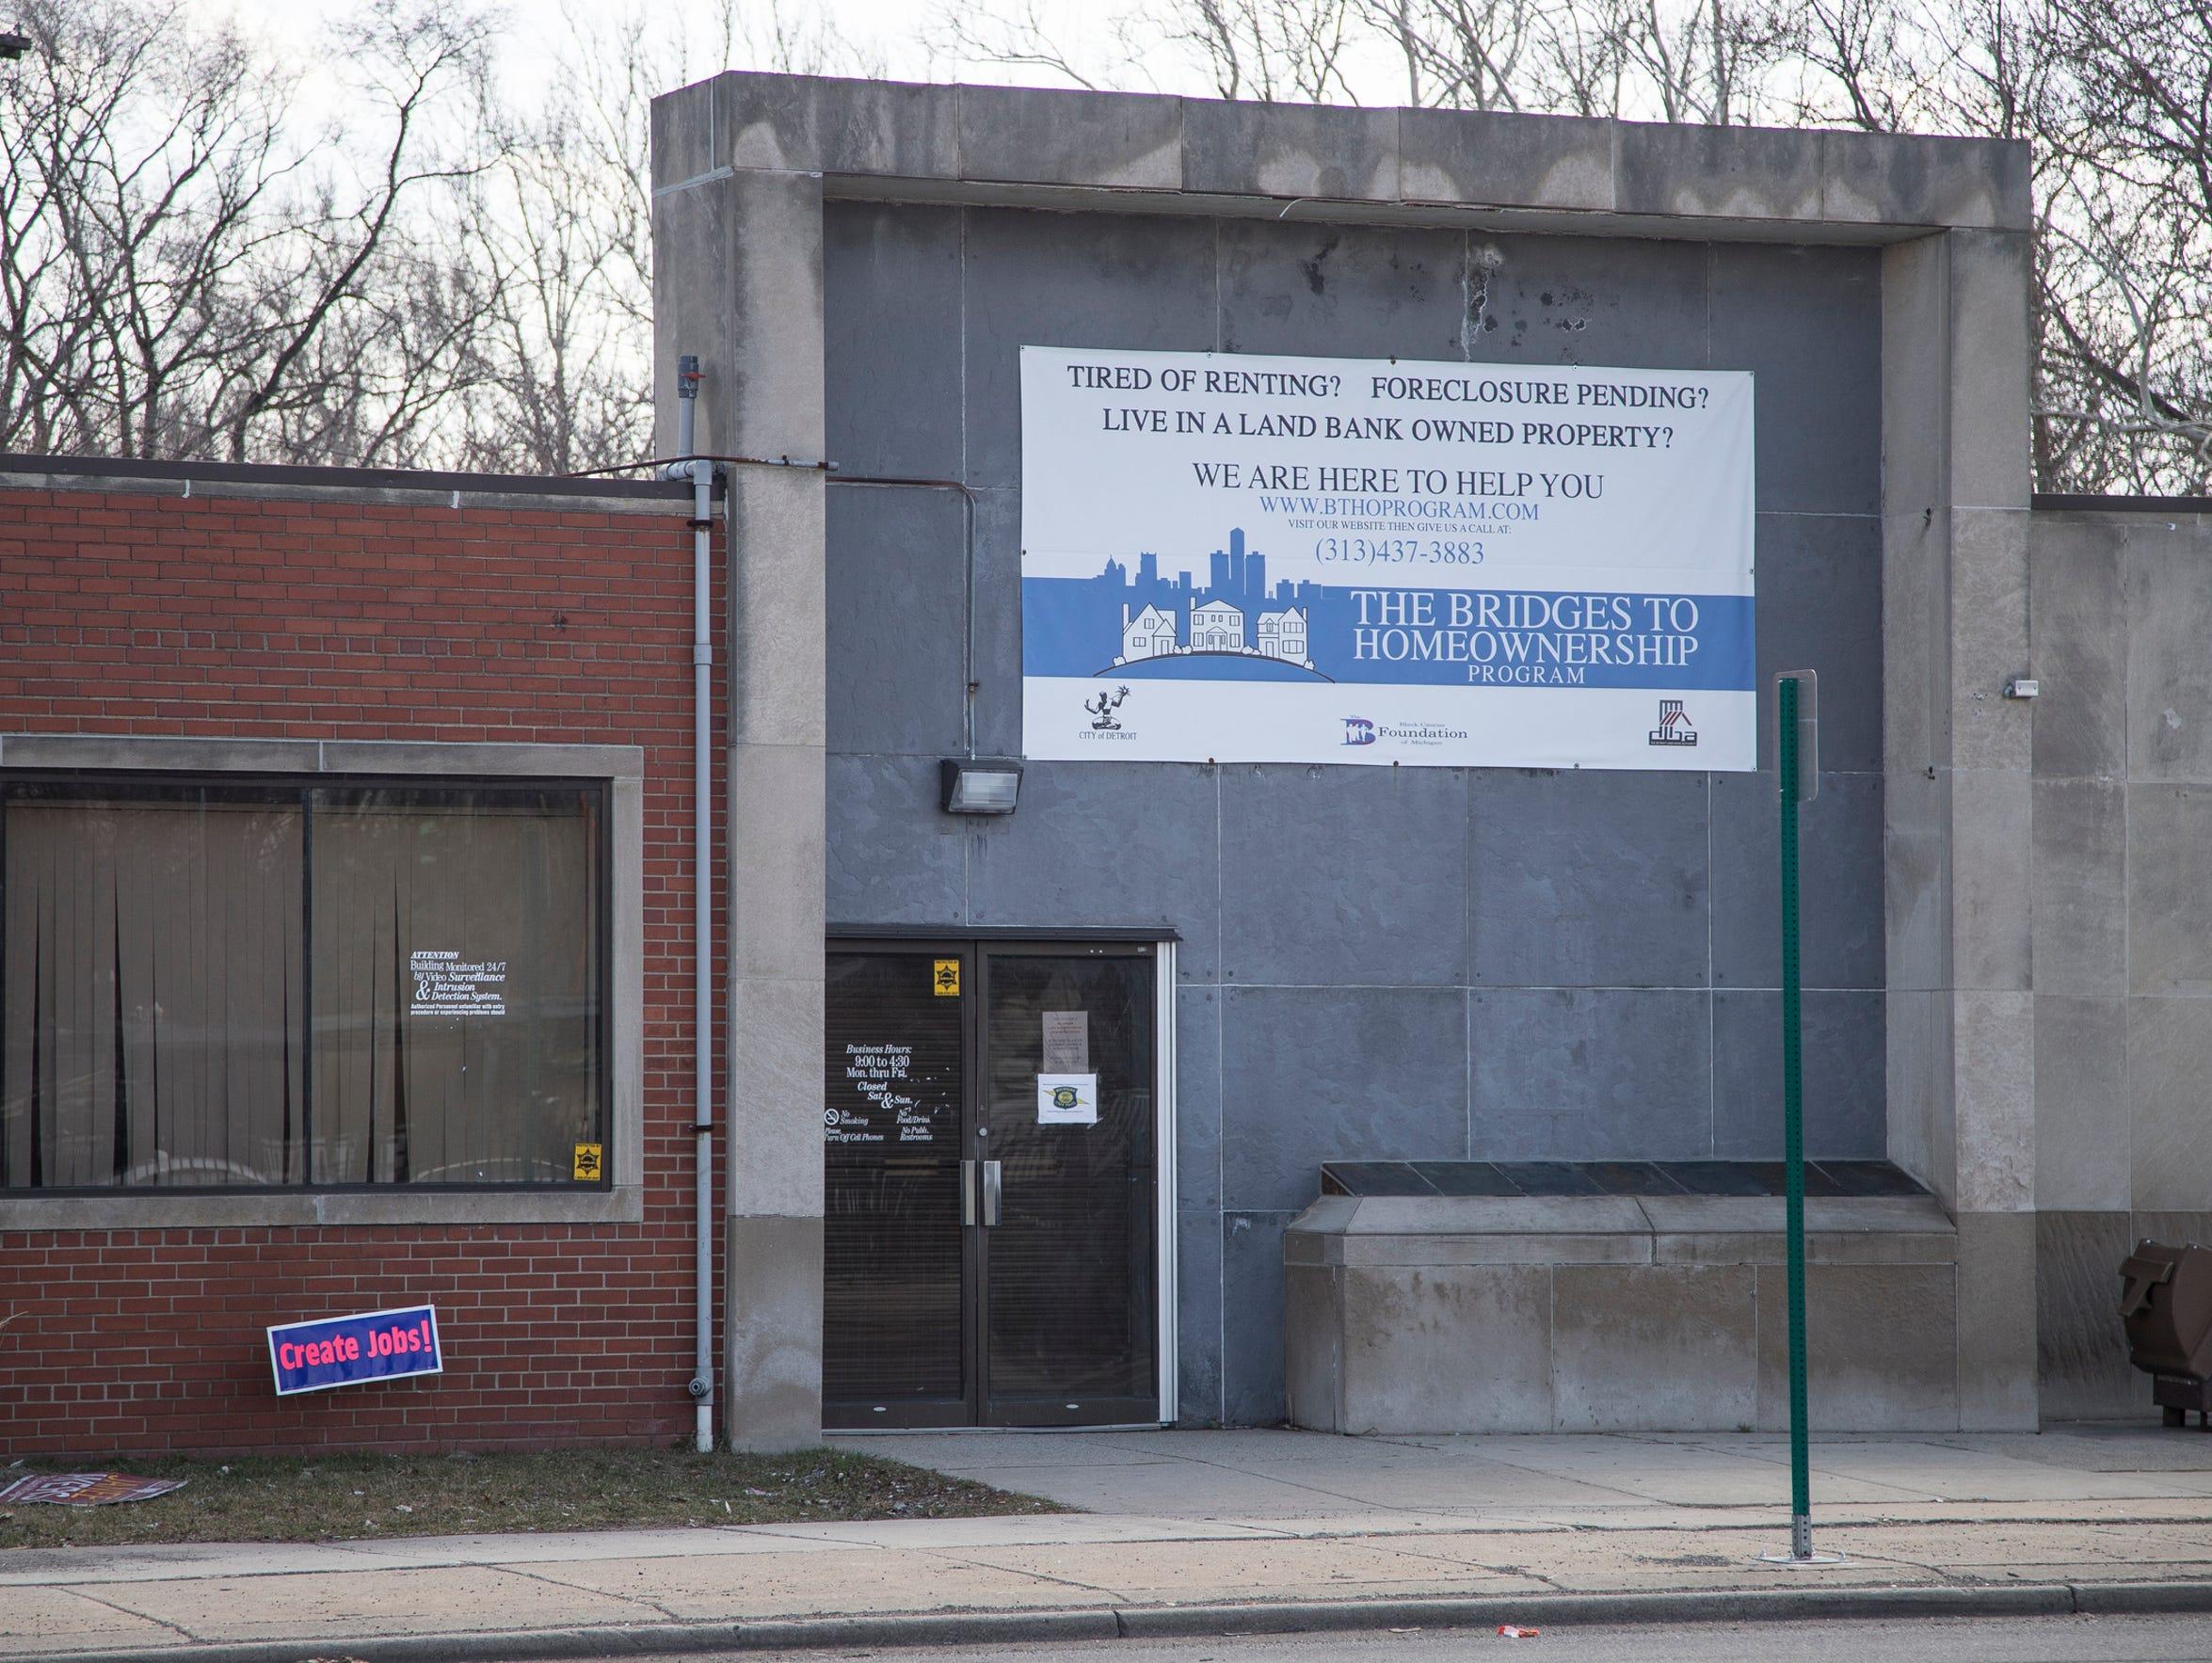 Office of the Bridges to Homeownership Program/ Black